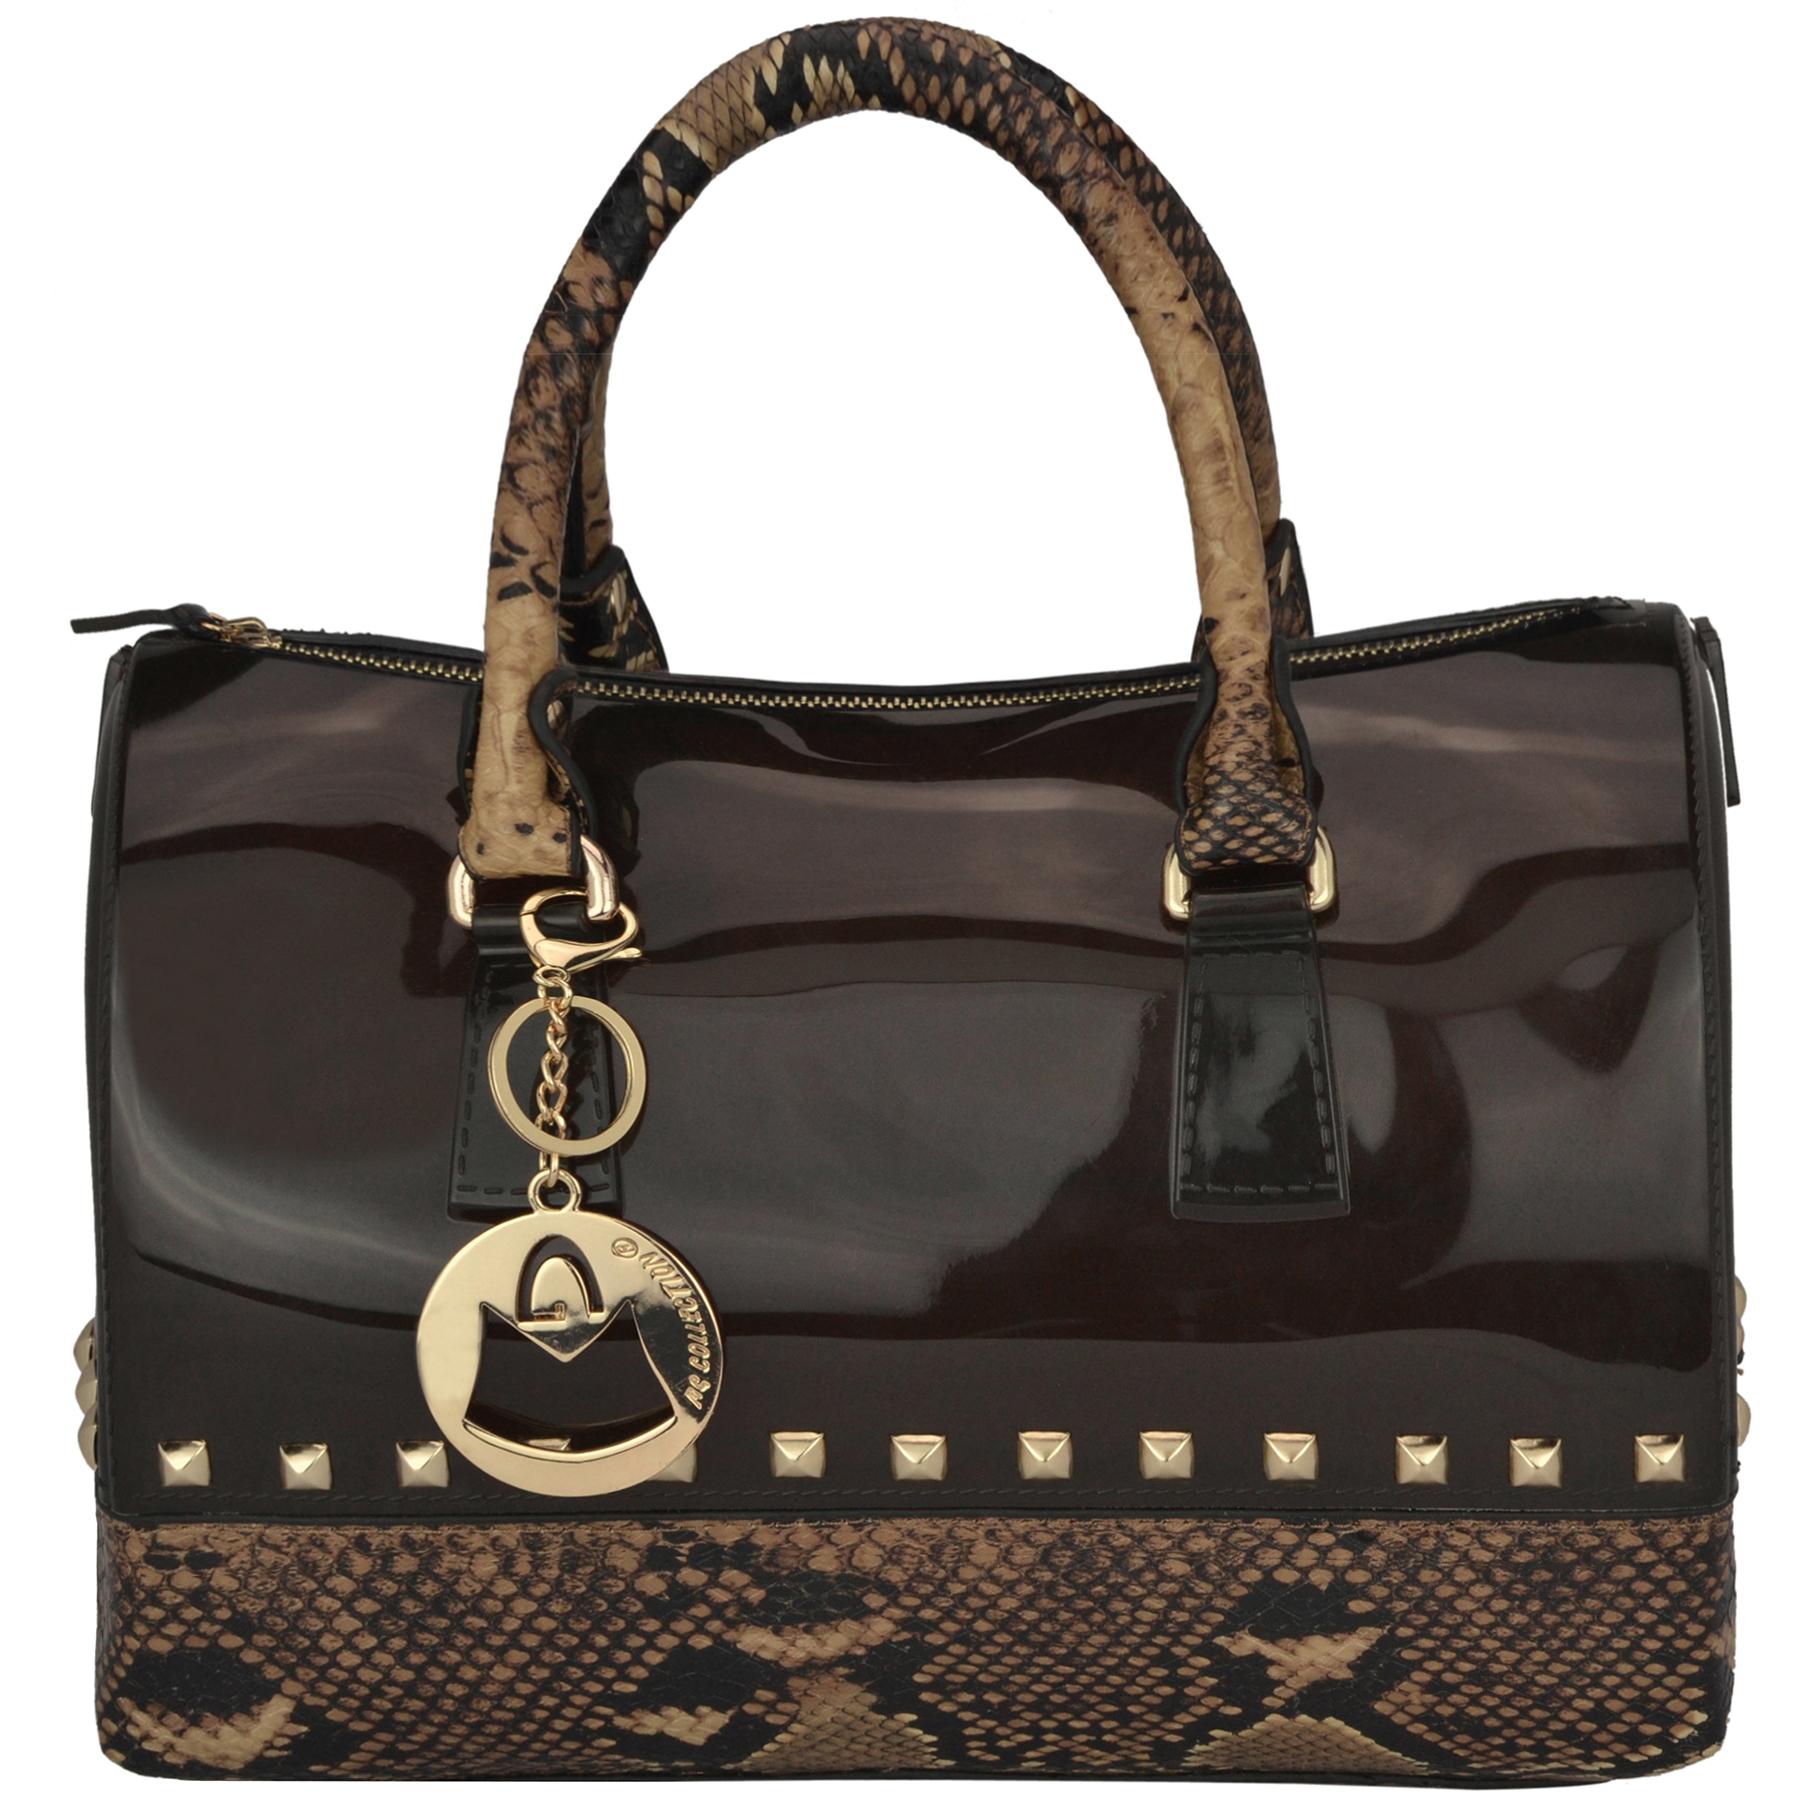 AMANI brown Jessie Style Doctor Handbag front image